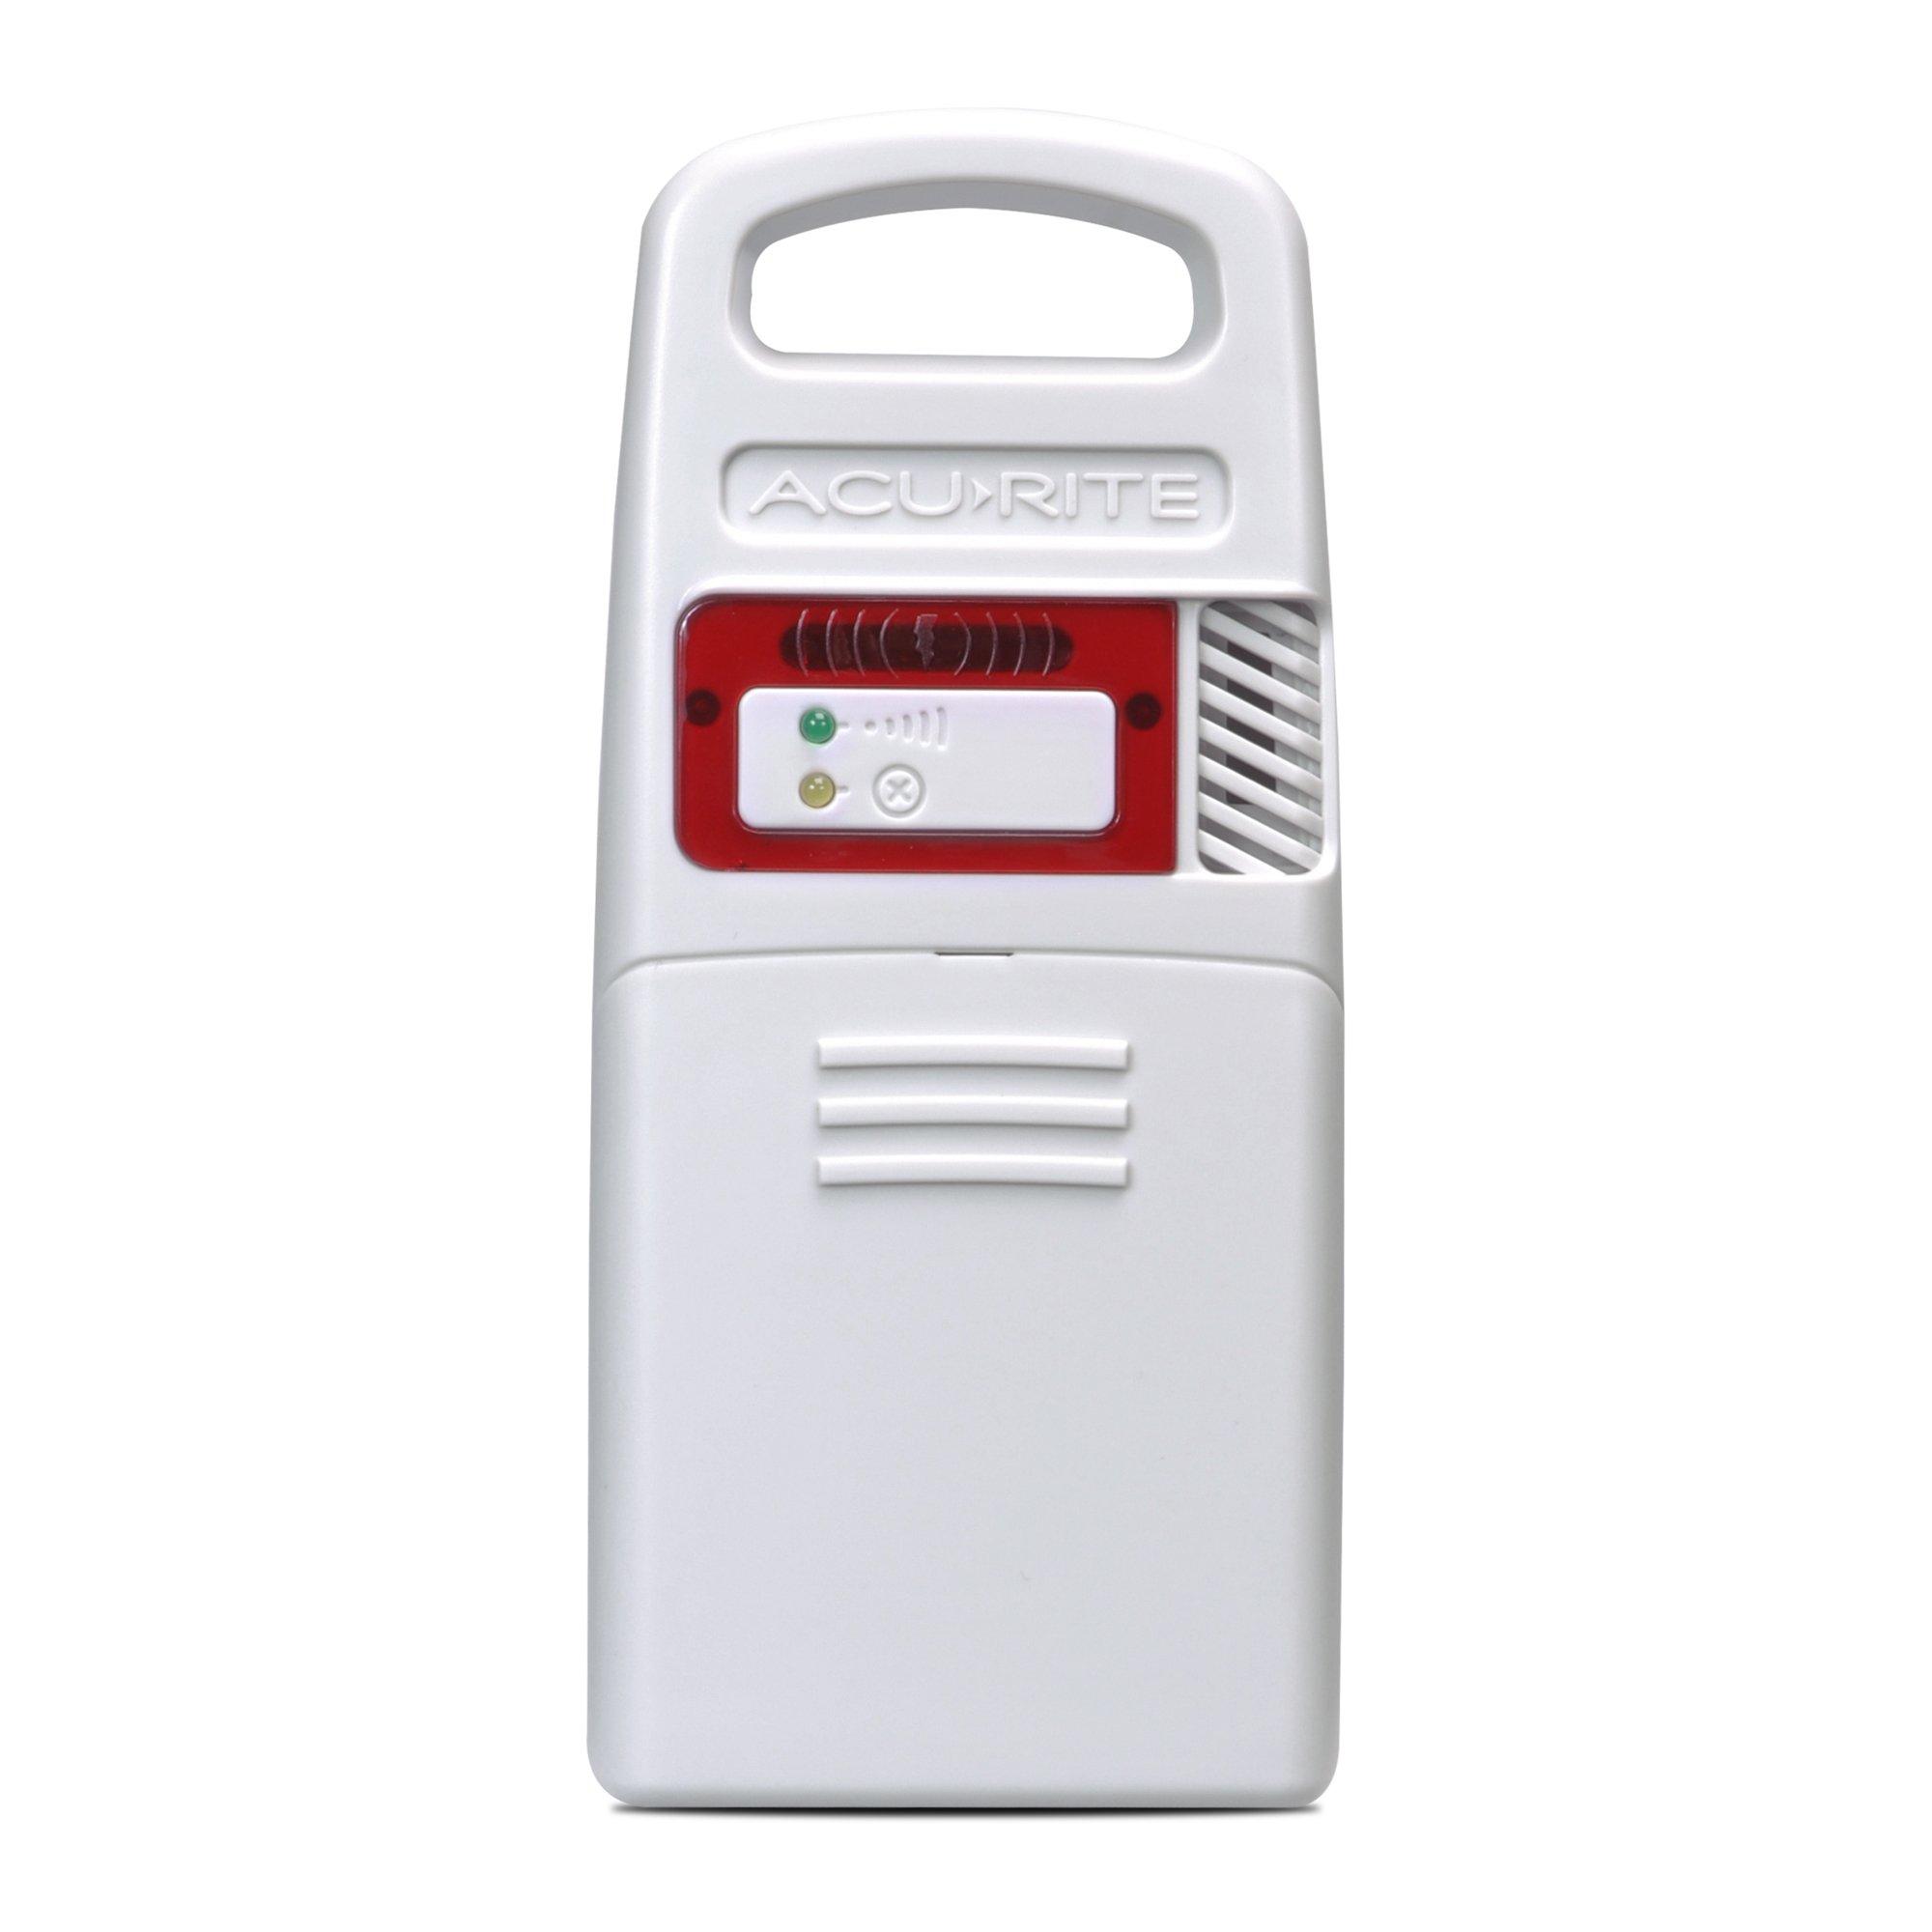 AcuRite 06045M Lightning Detector Sensor with Temperature & Humidity